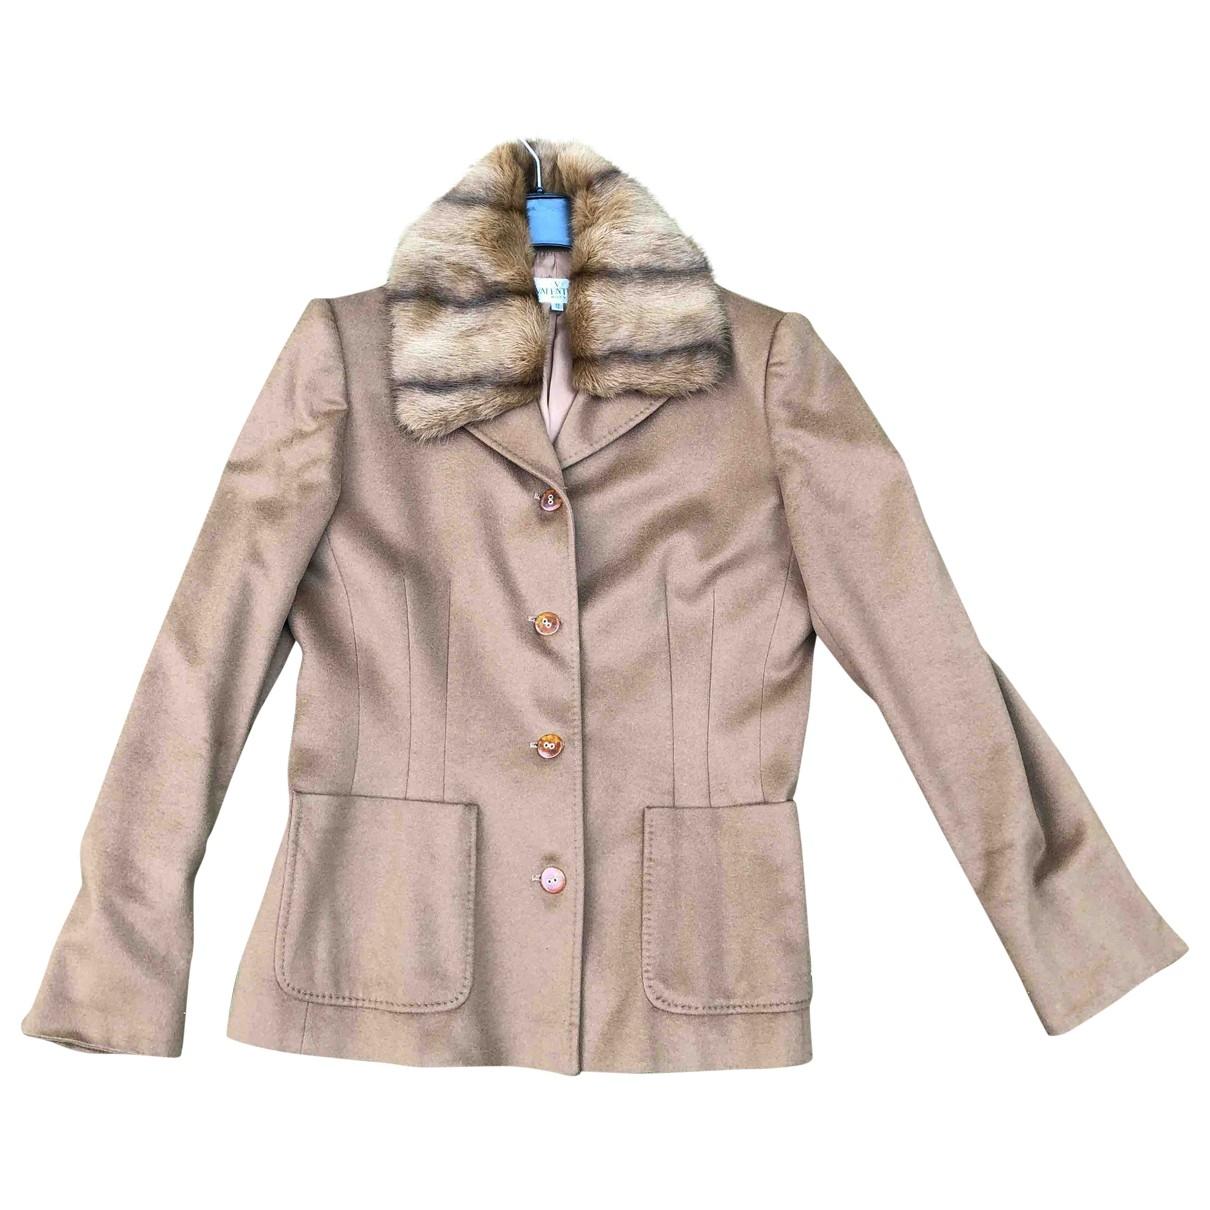 Valentino Garavani \N Camel Fur jacket for Women 46 IT